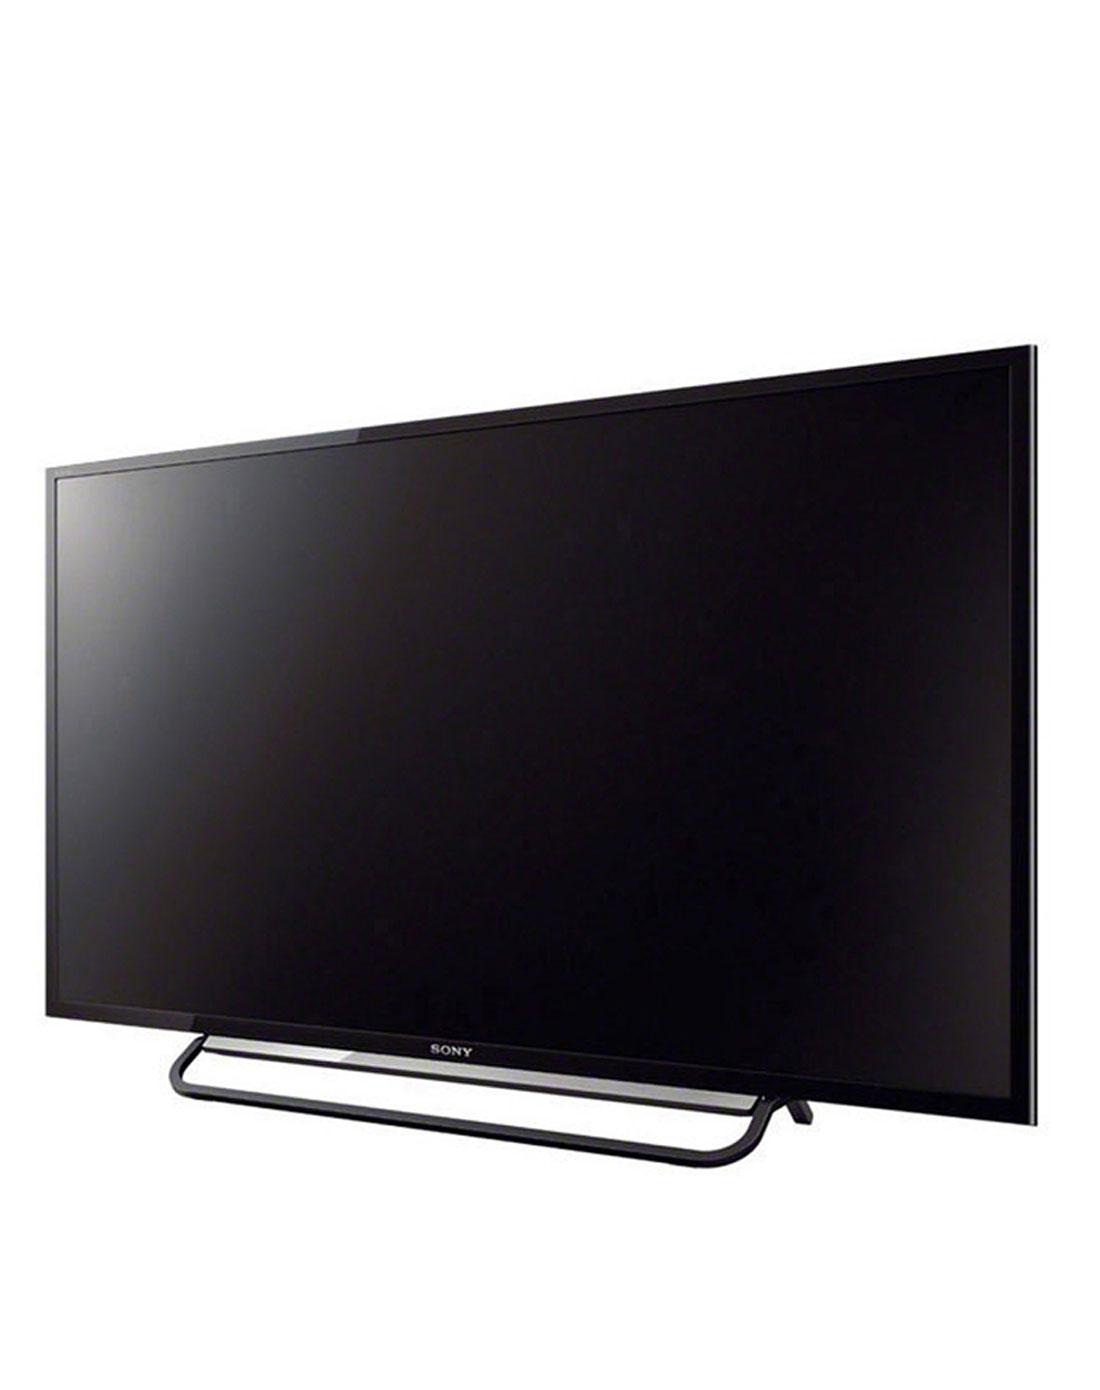 > 48英寸高清led液晶电视